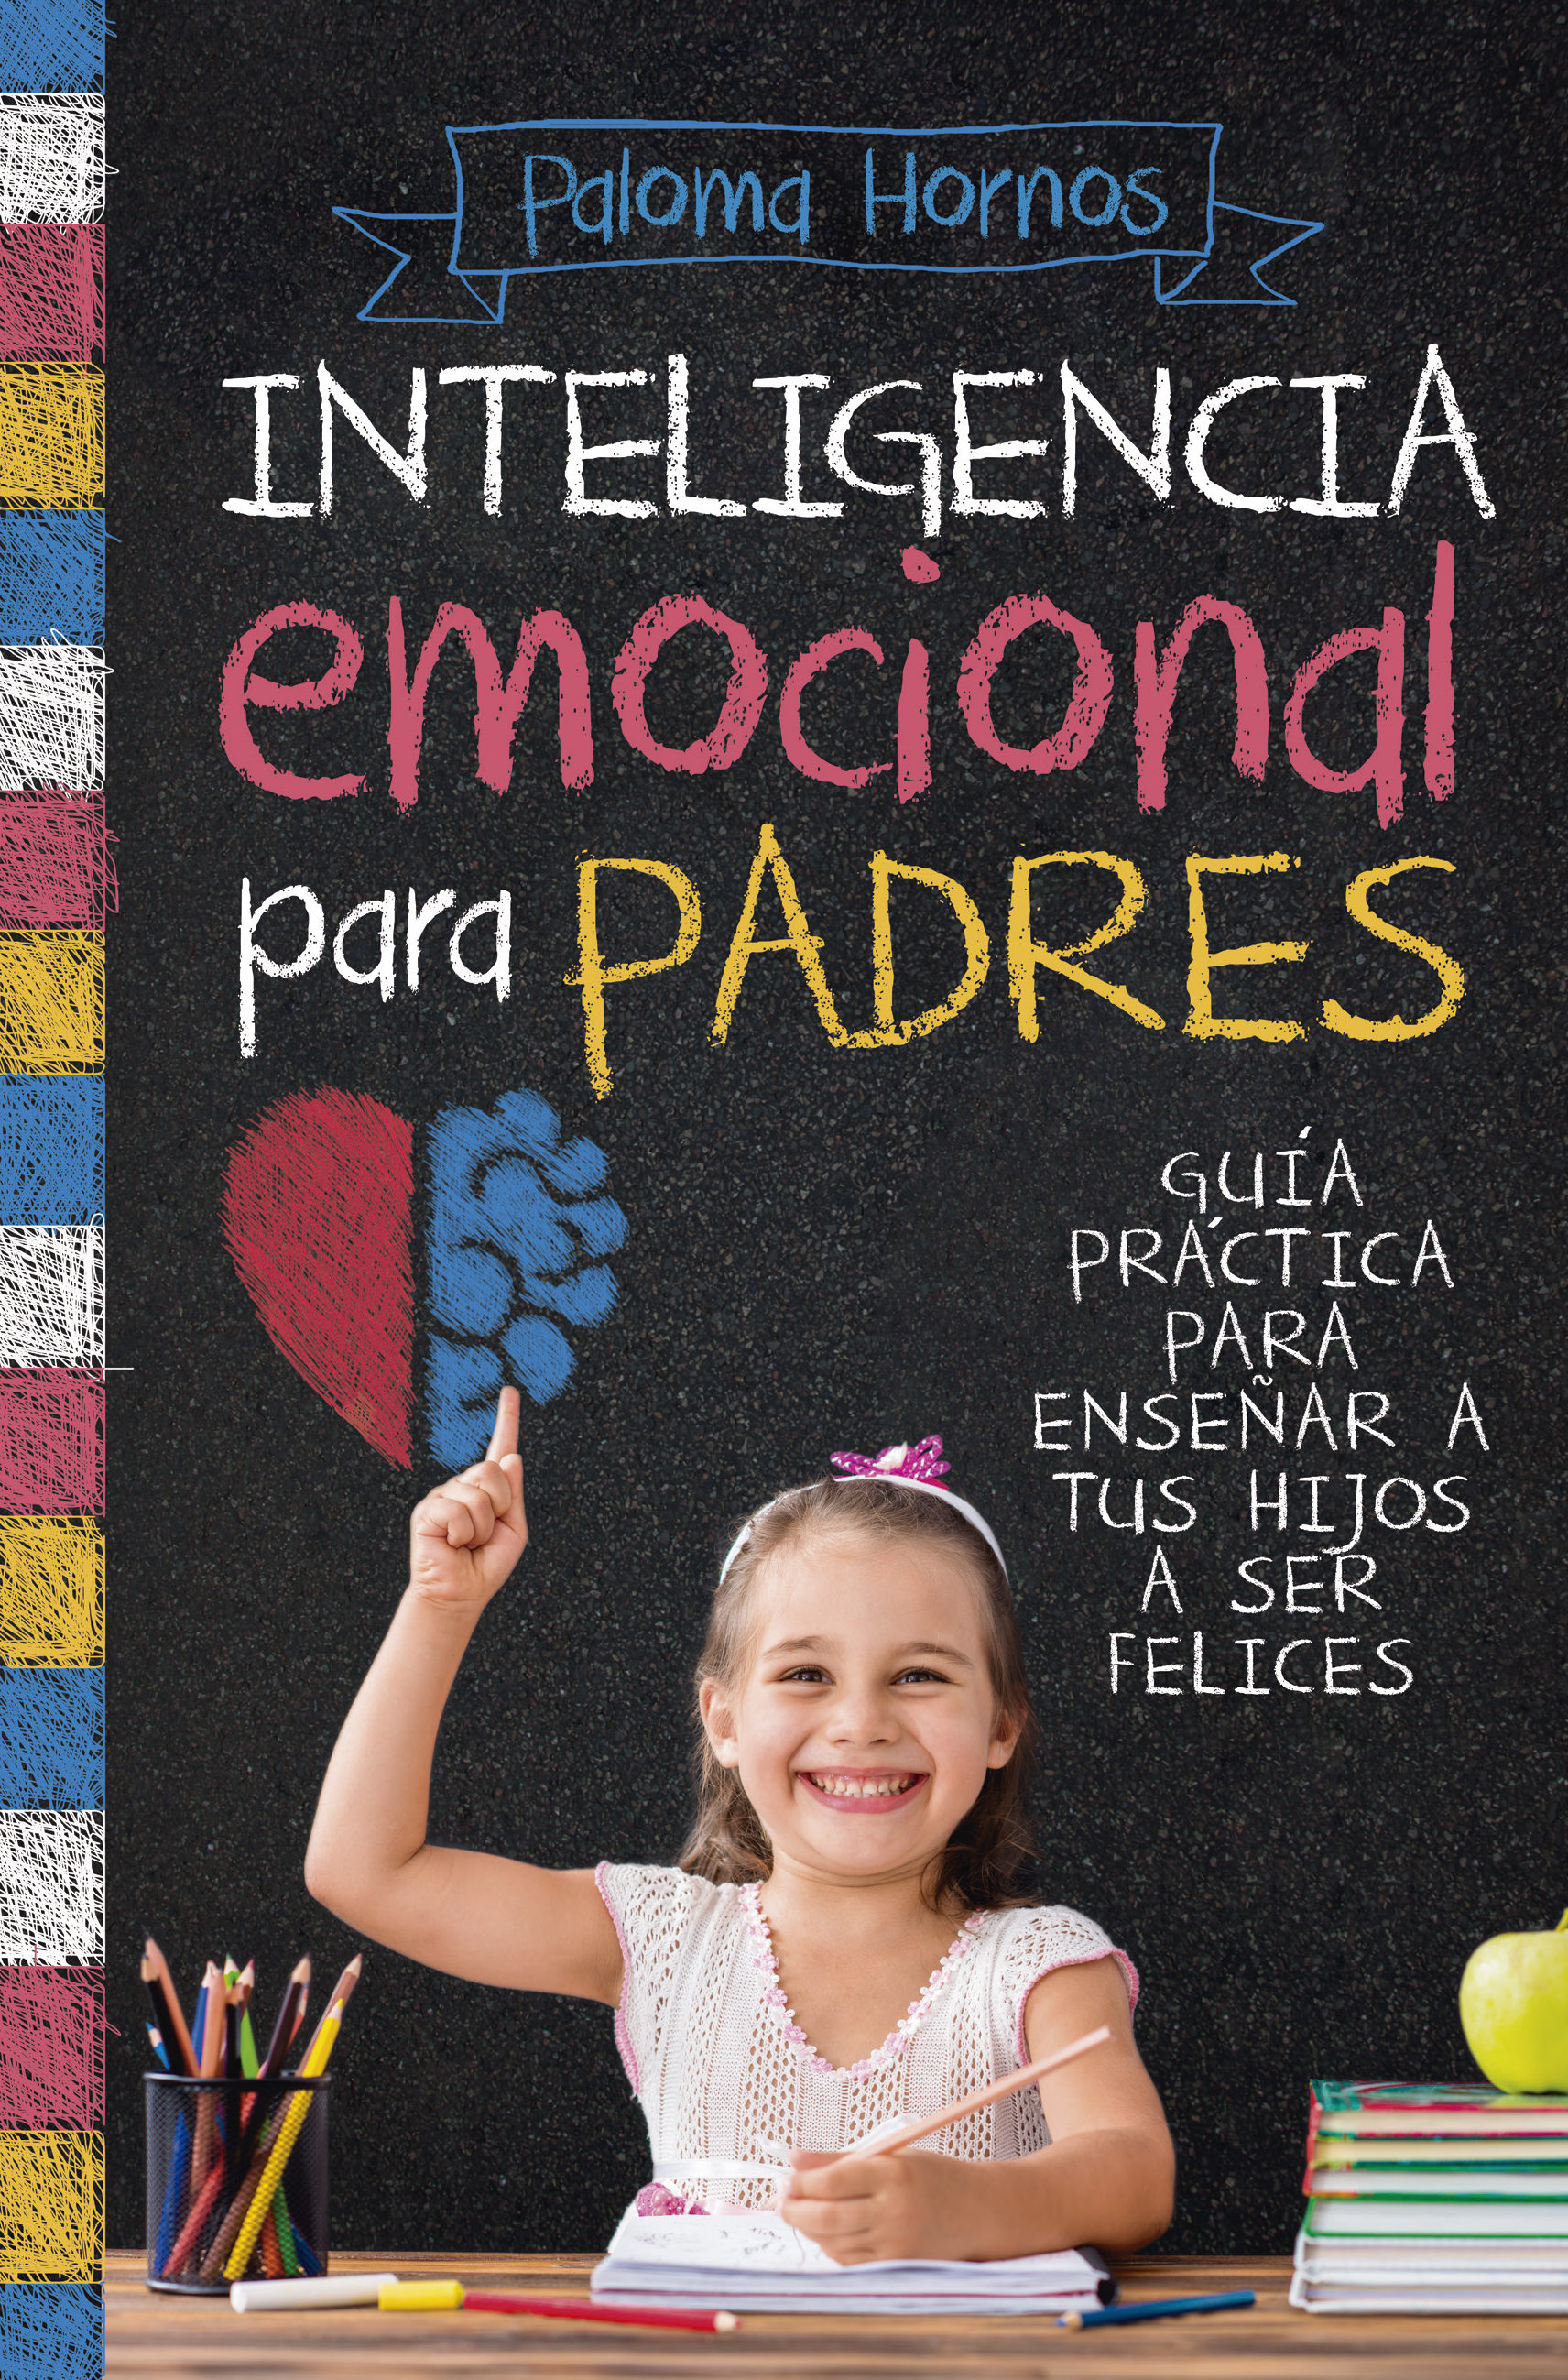 43 - Paloma Hornos Redondo - Arcopress Ediciones